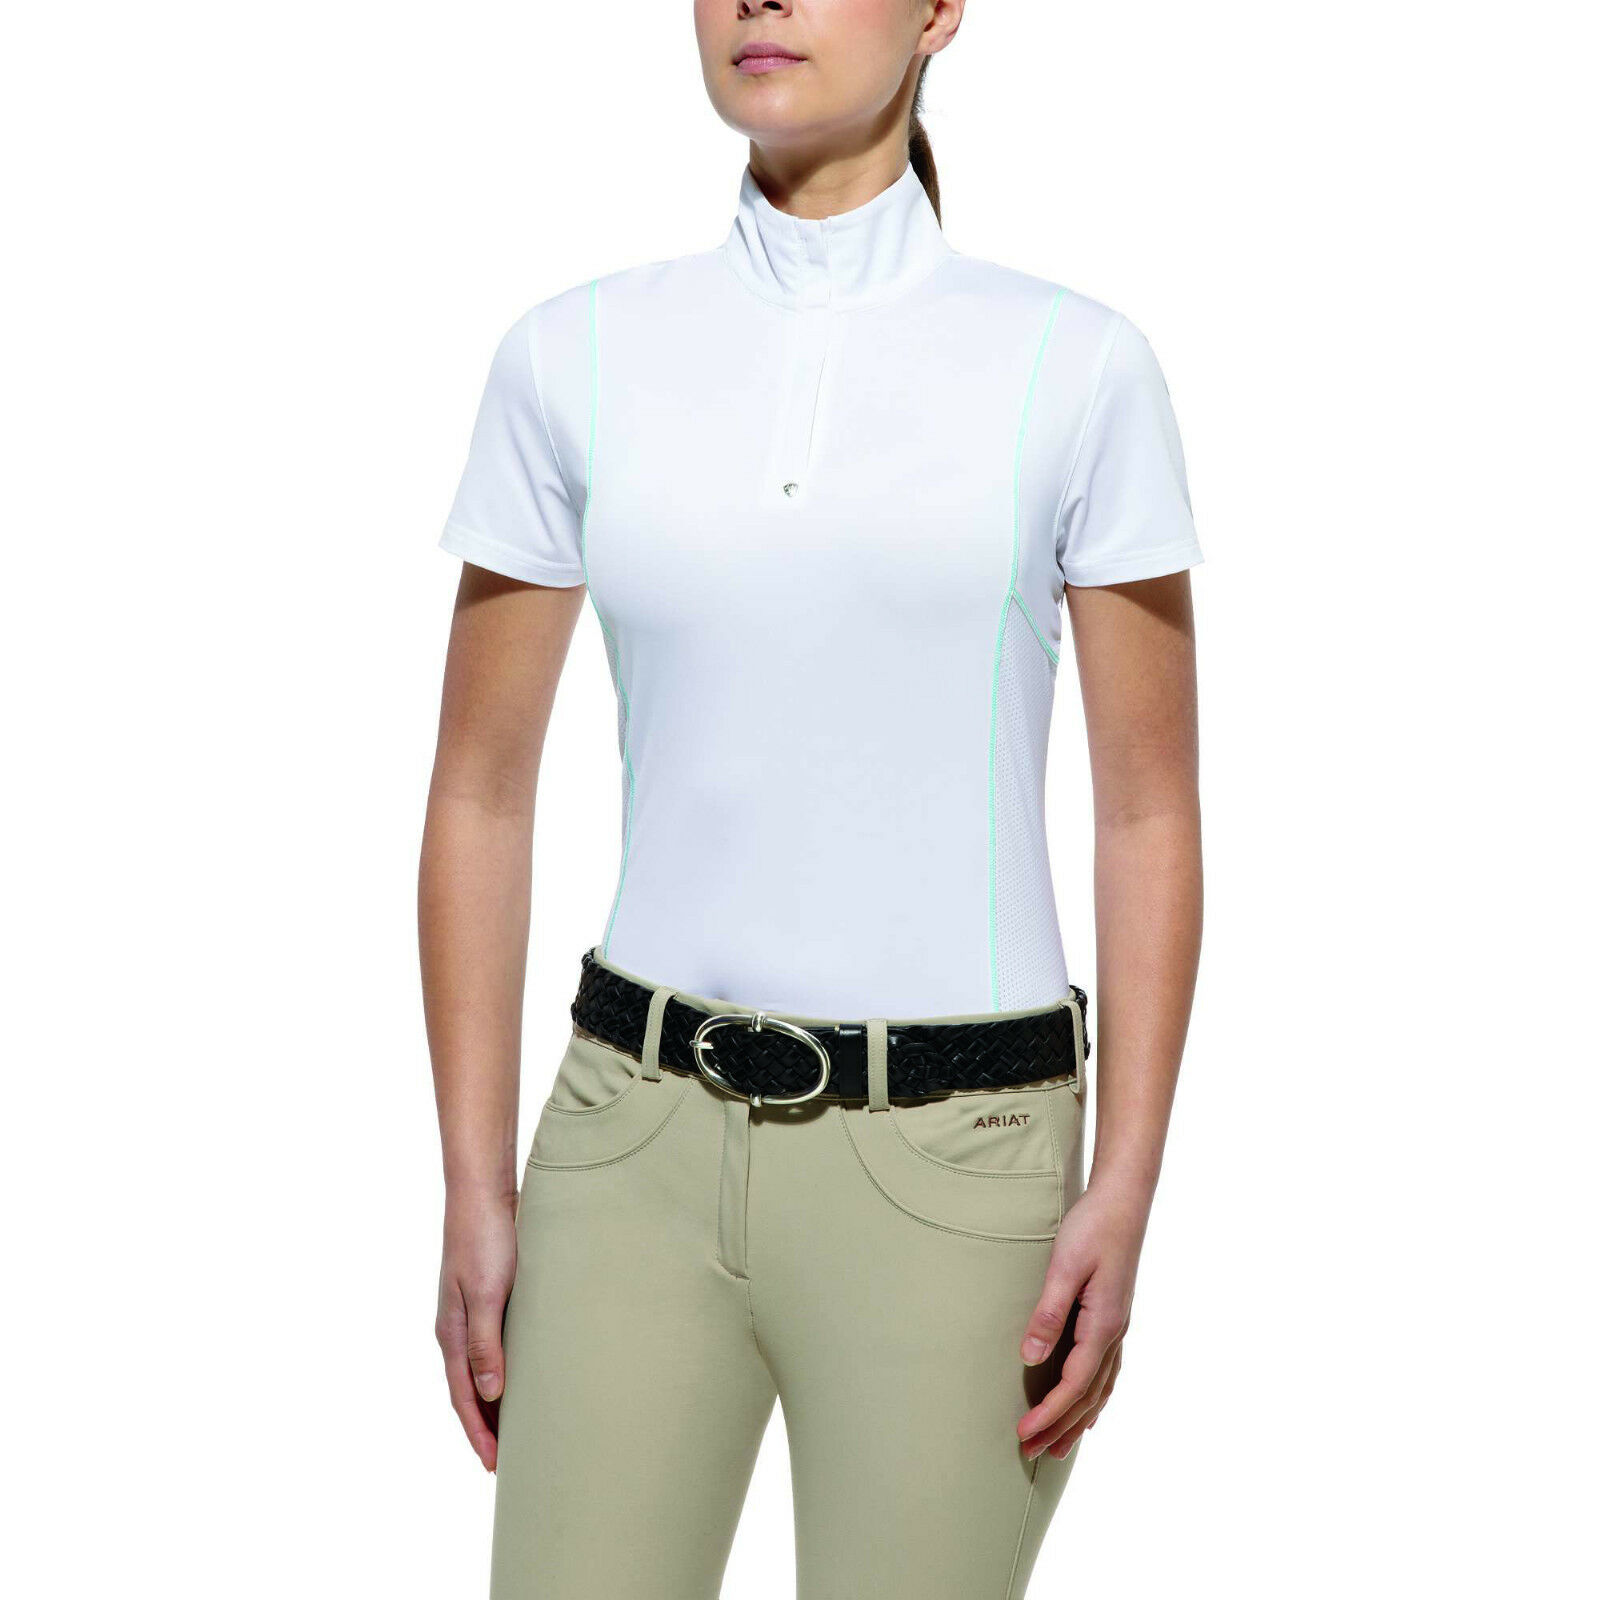 ARIAT - Women's Cambria 1 4 Zip Top - White - ( 10010490 ) - New